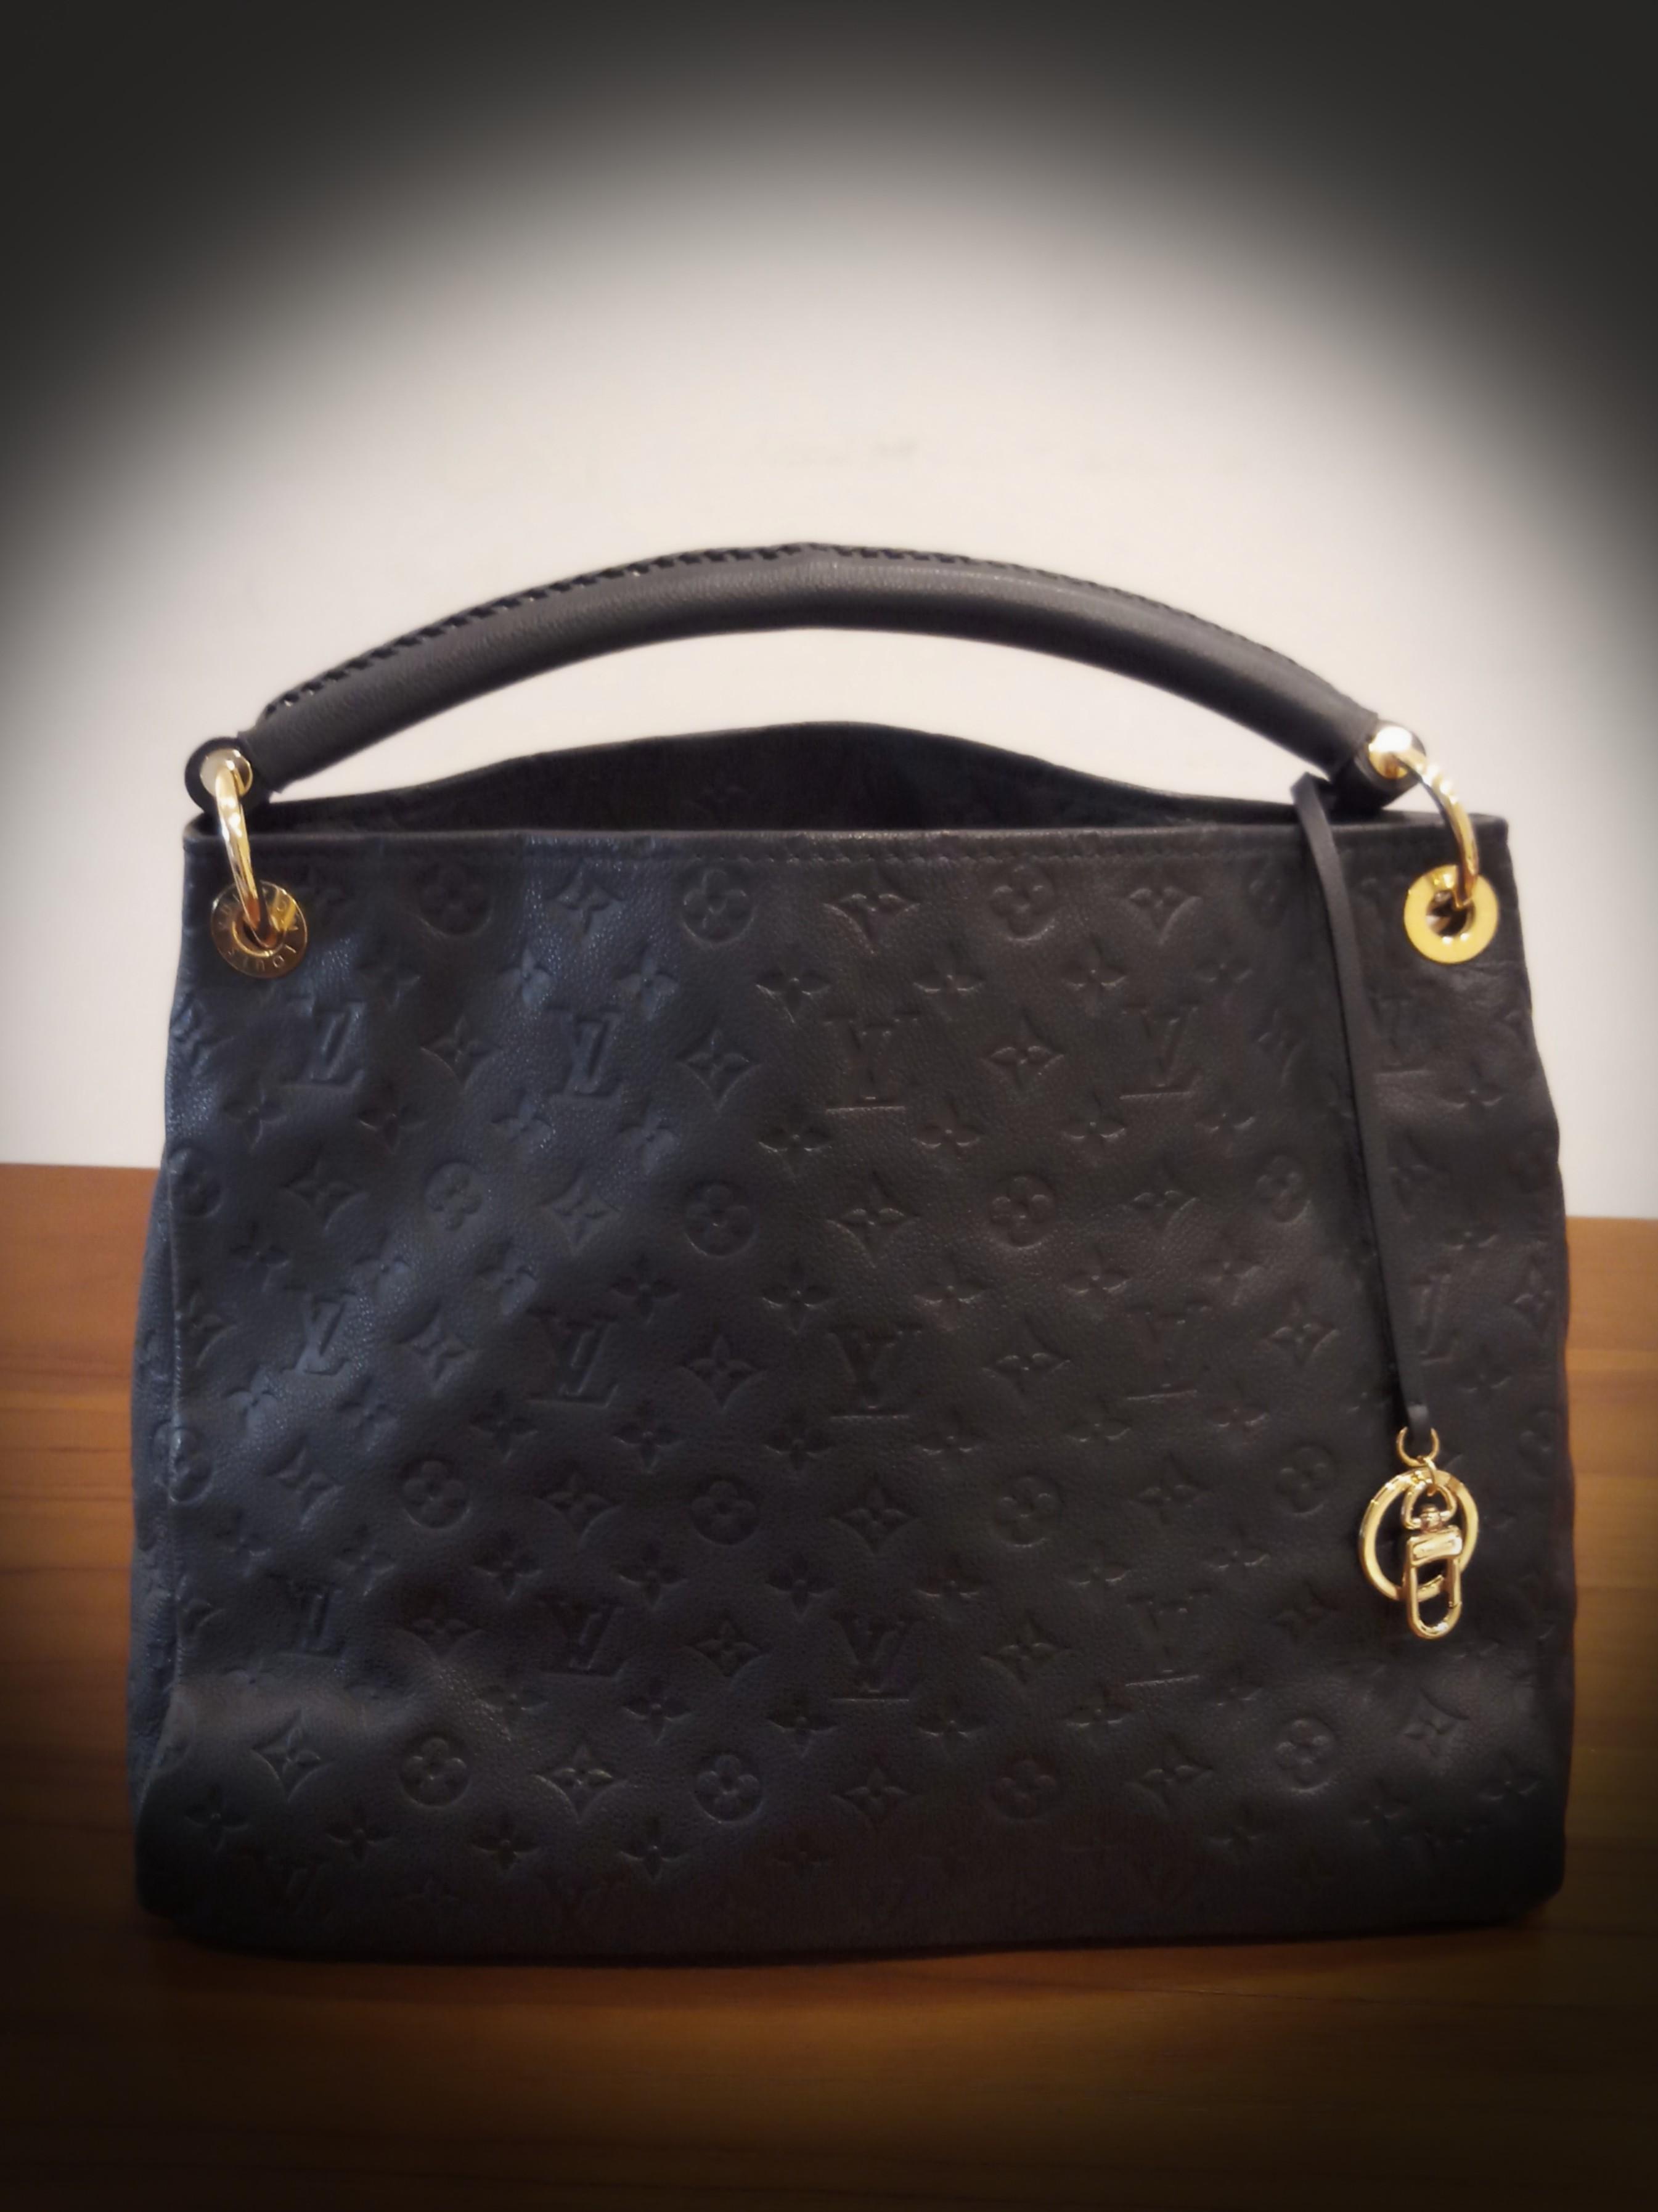 a2ffadcf9848 Louis Vuitton ARTSY MM Tote Bag~ Monogram Empreinte Leather